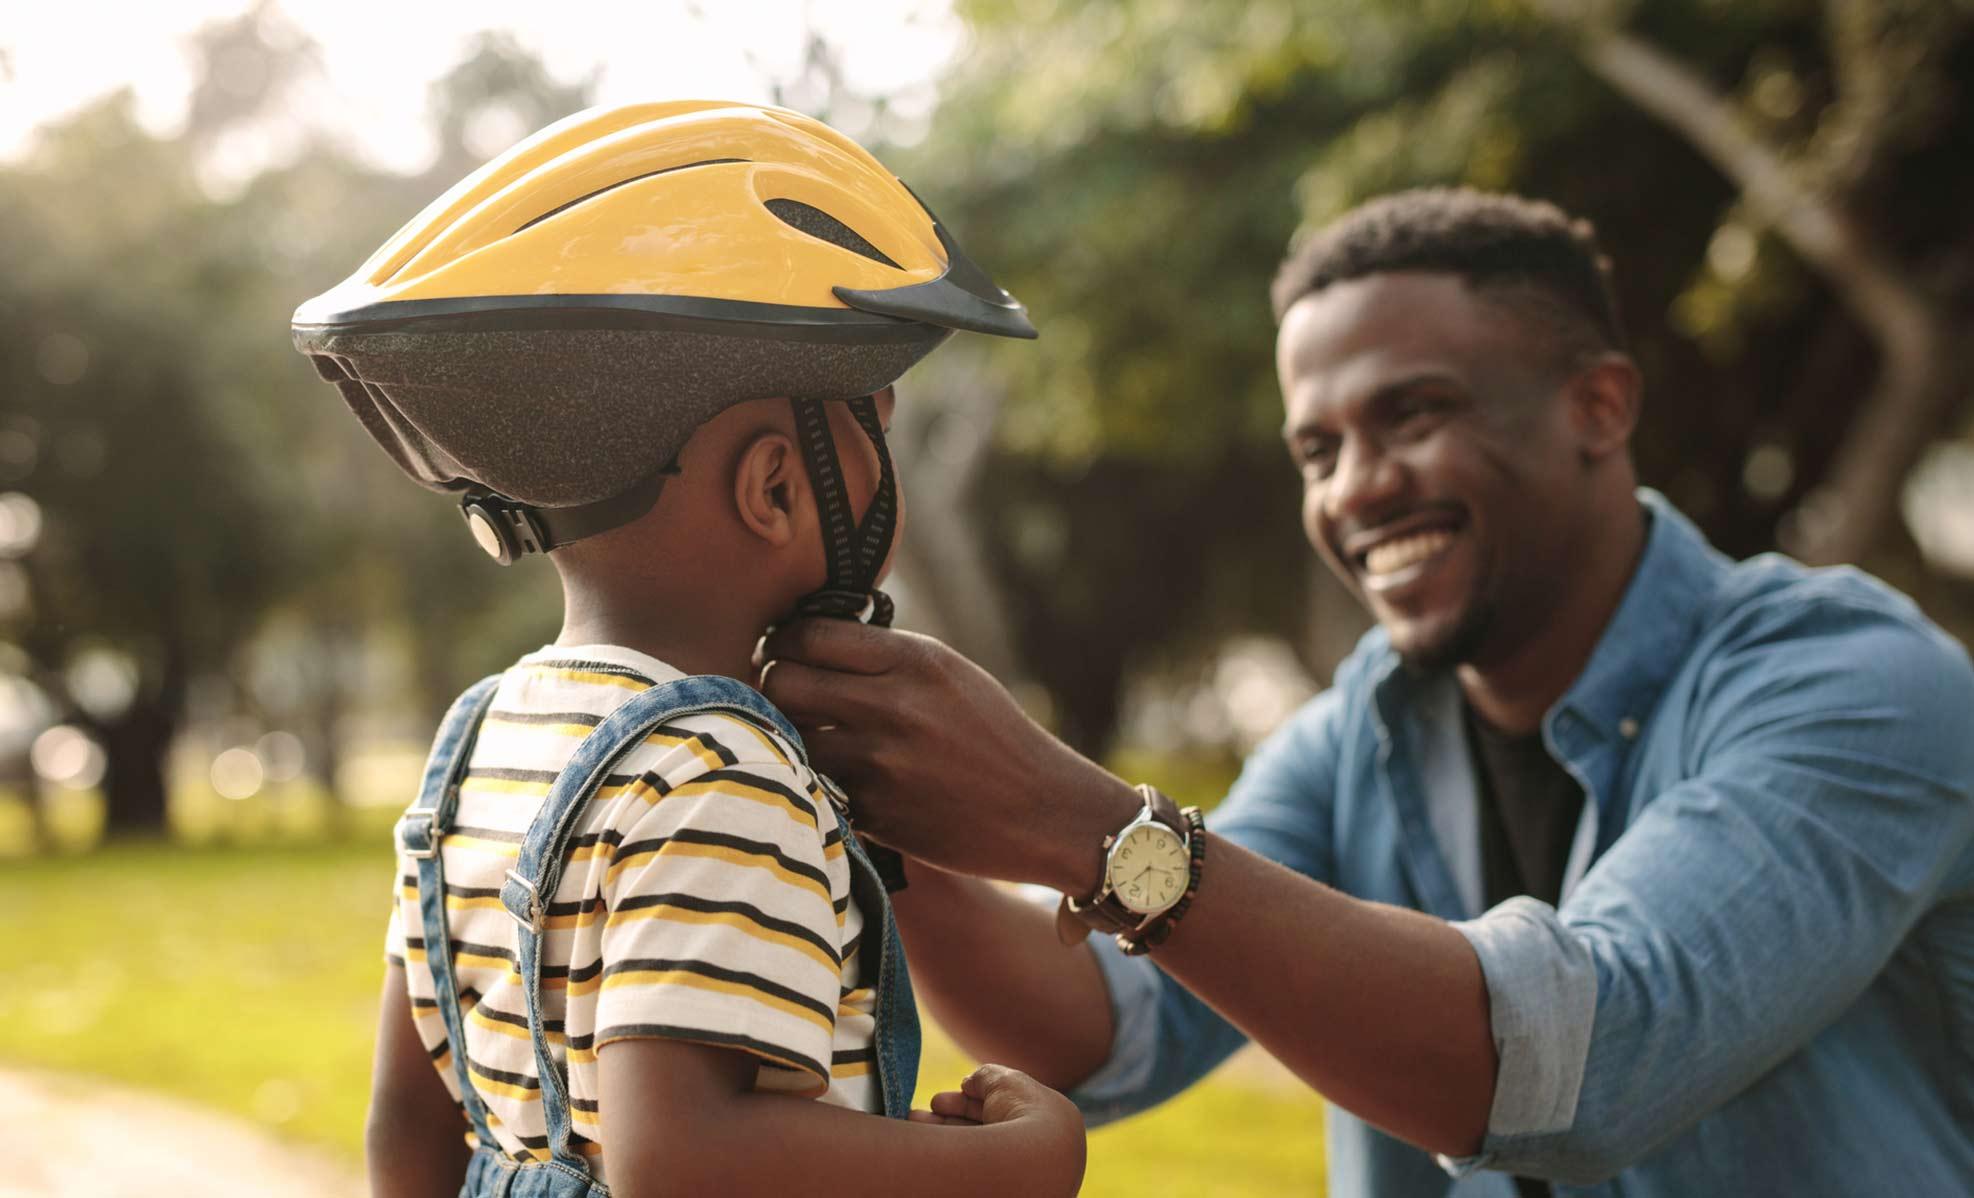 dad helping son with bike helmet